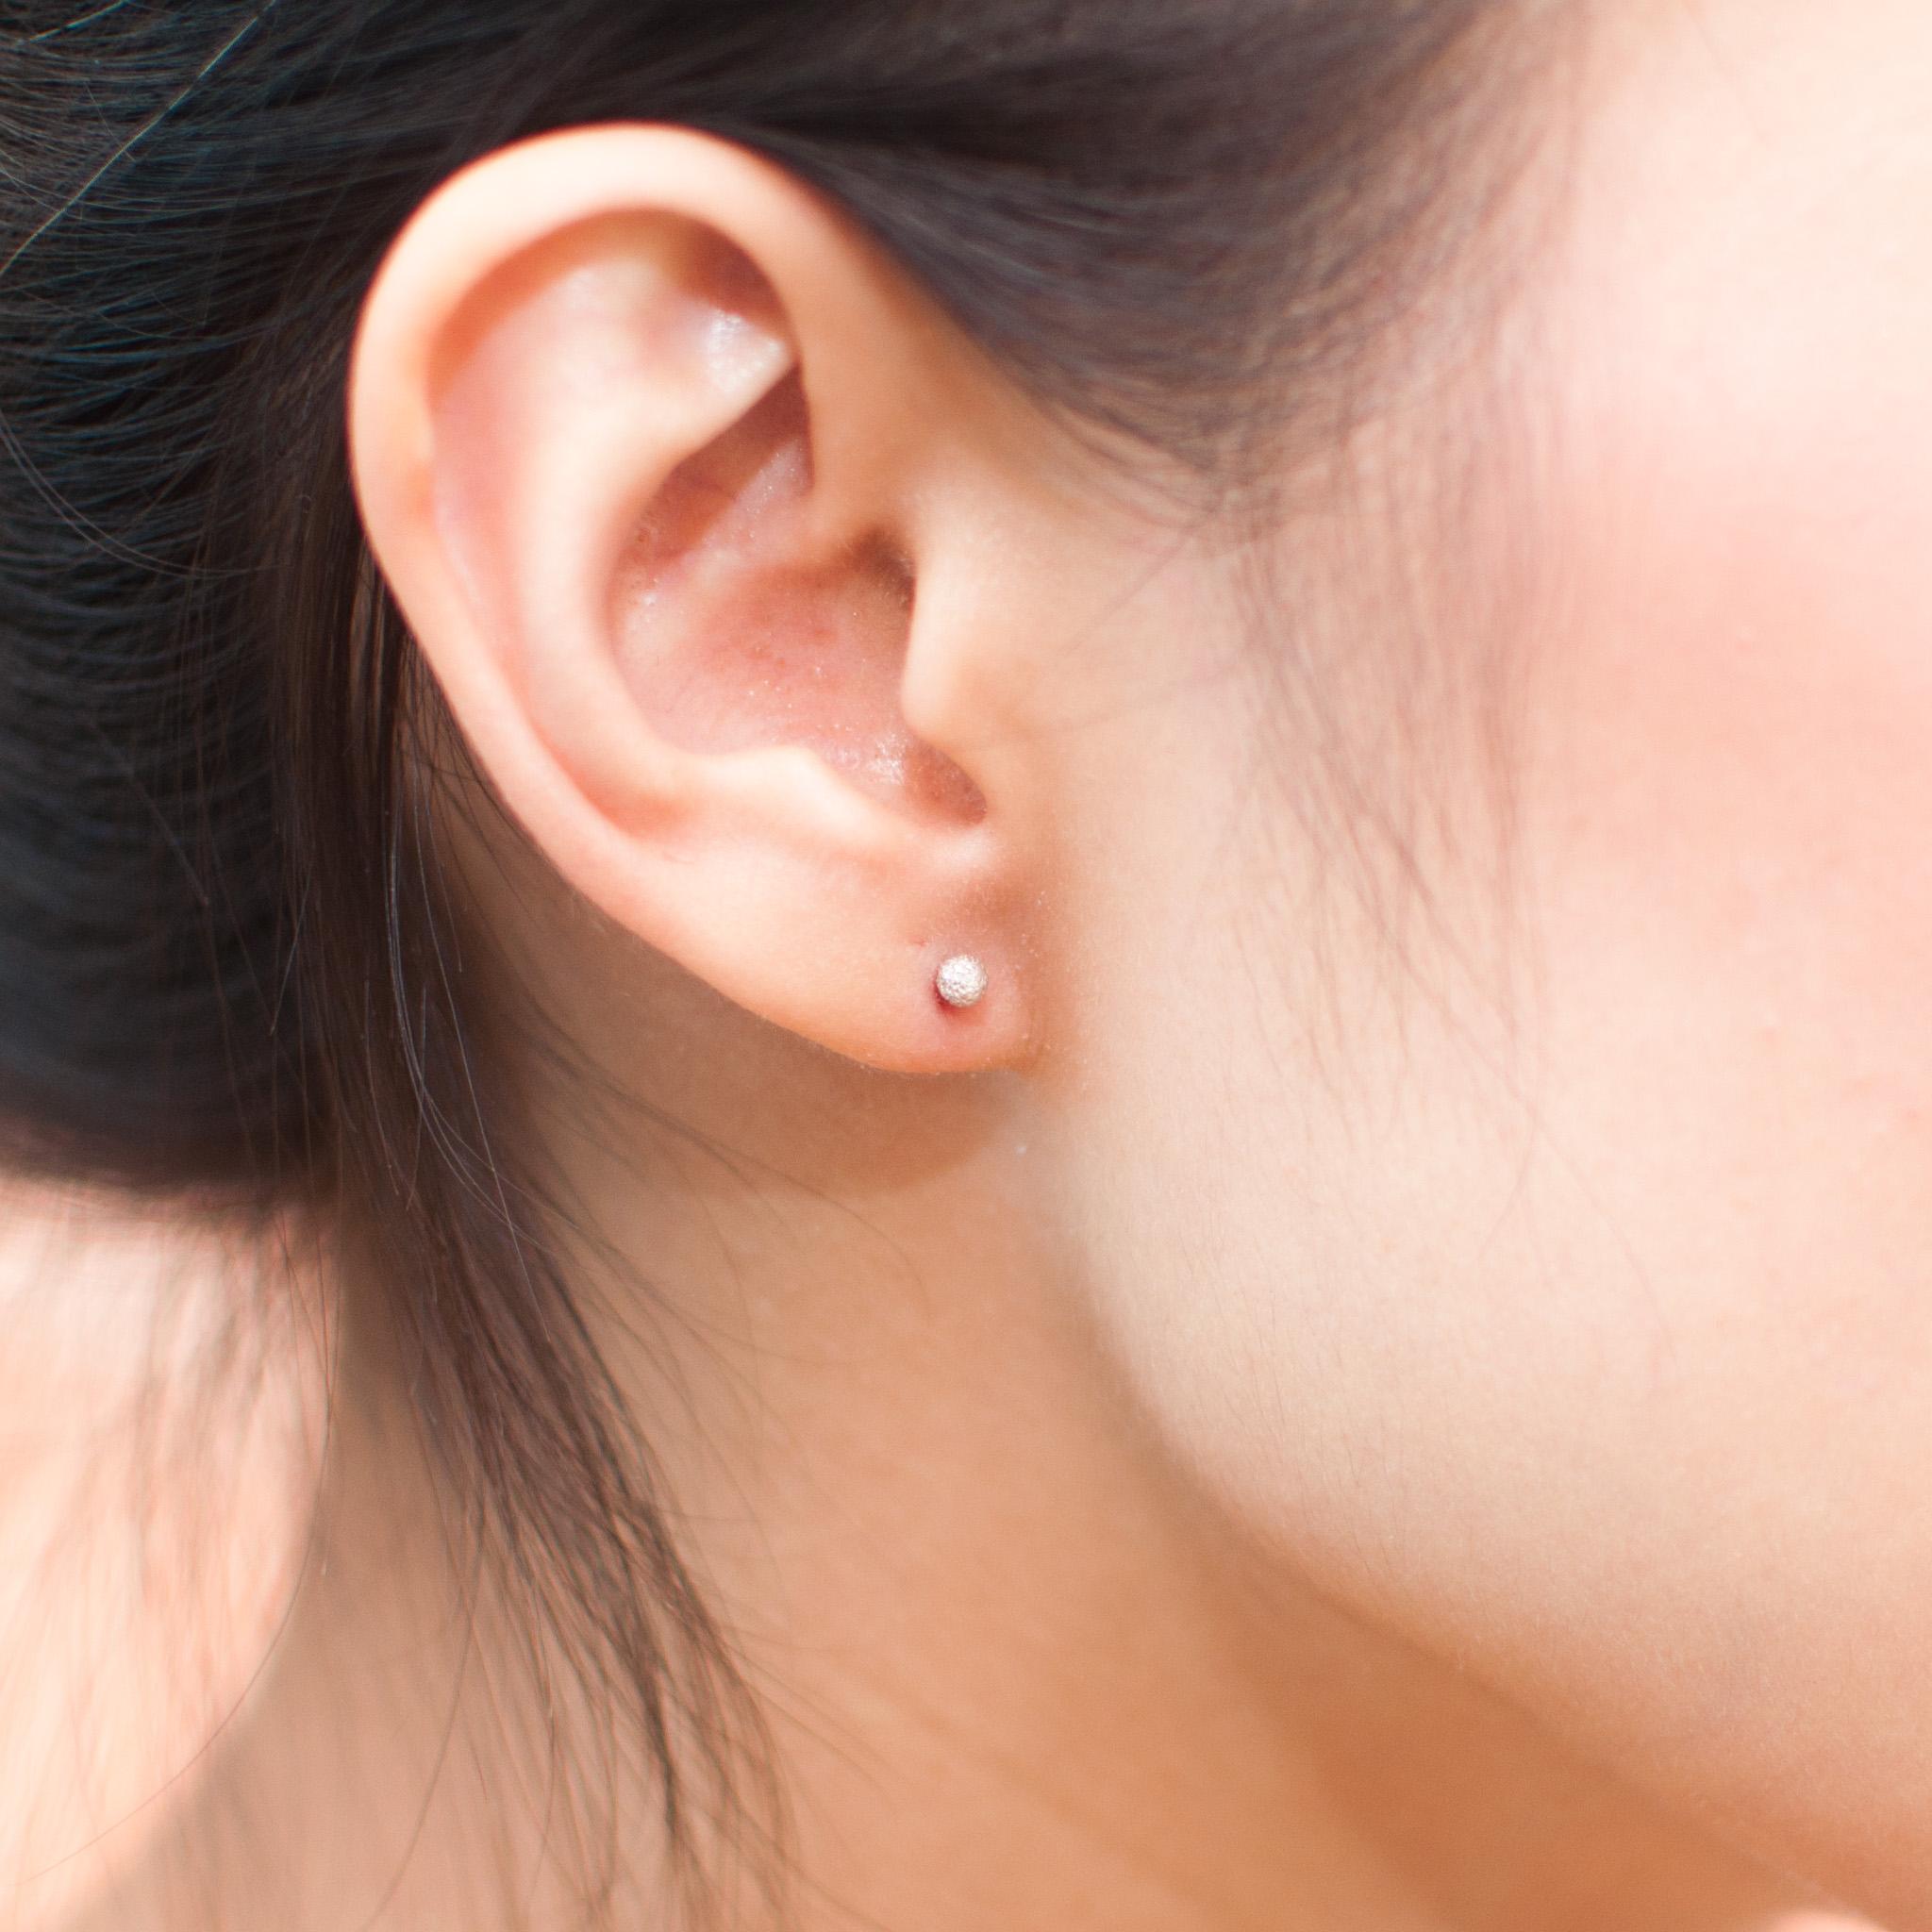 5bd93dbb74b8c8 Tiny Crystal Sterling Silver Stud Earrings, Earrings For Women ...